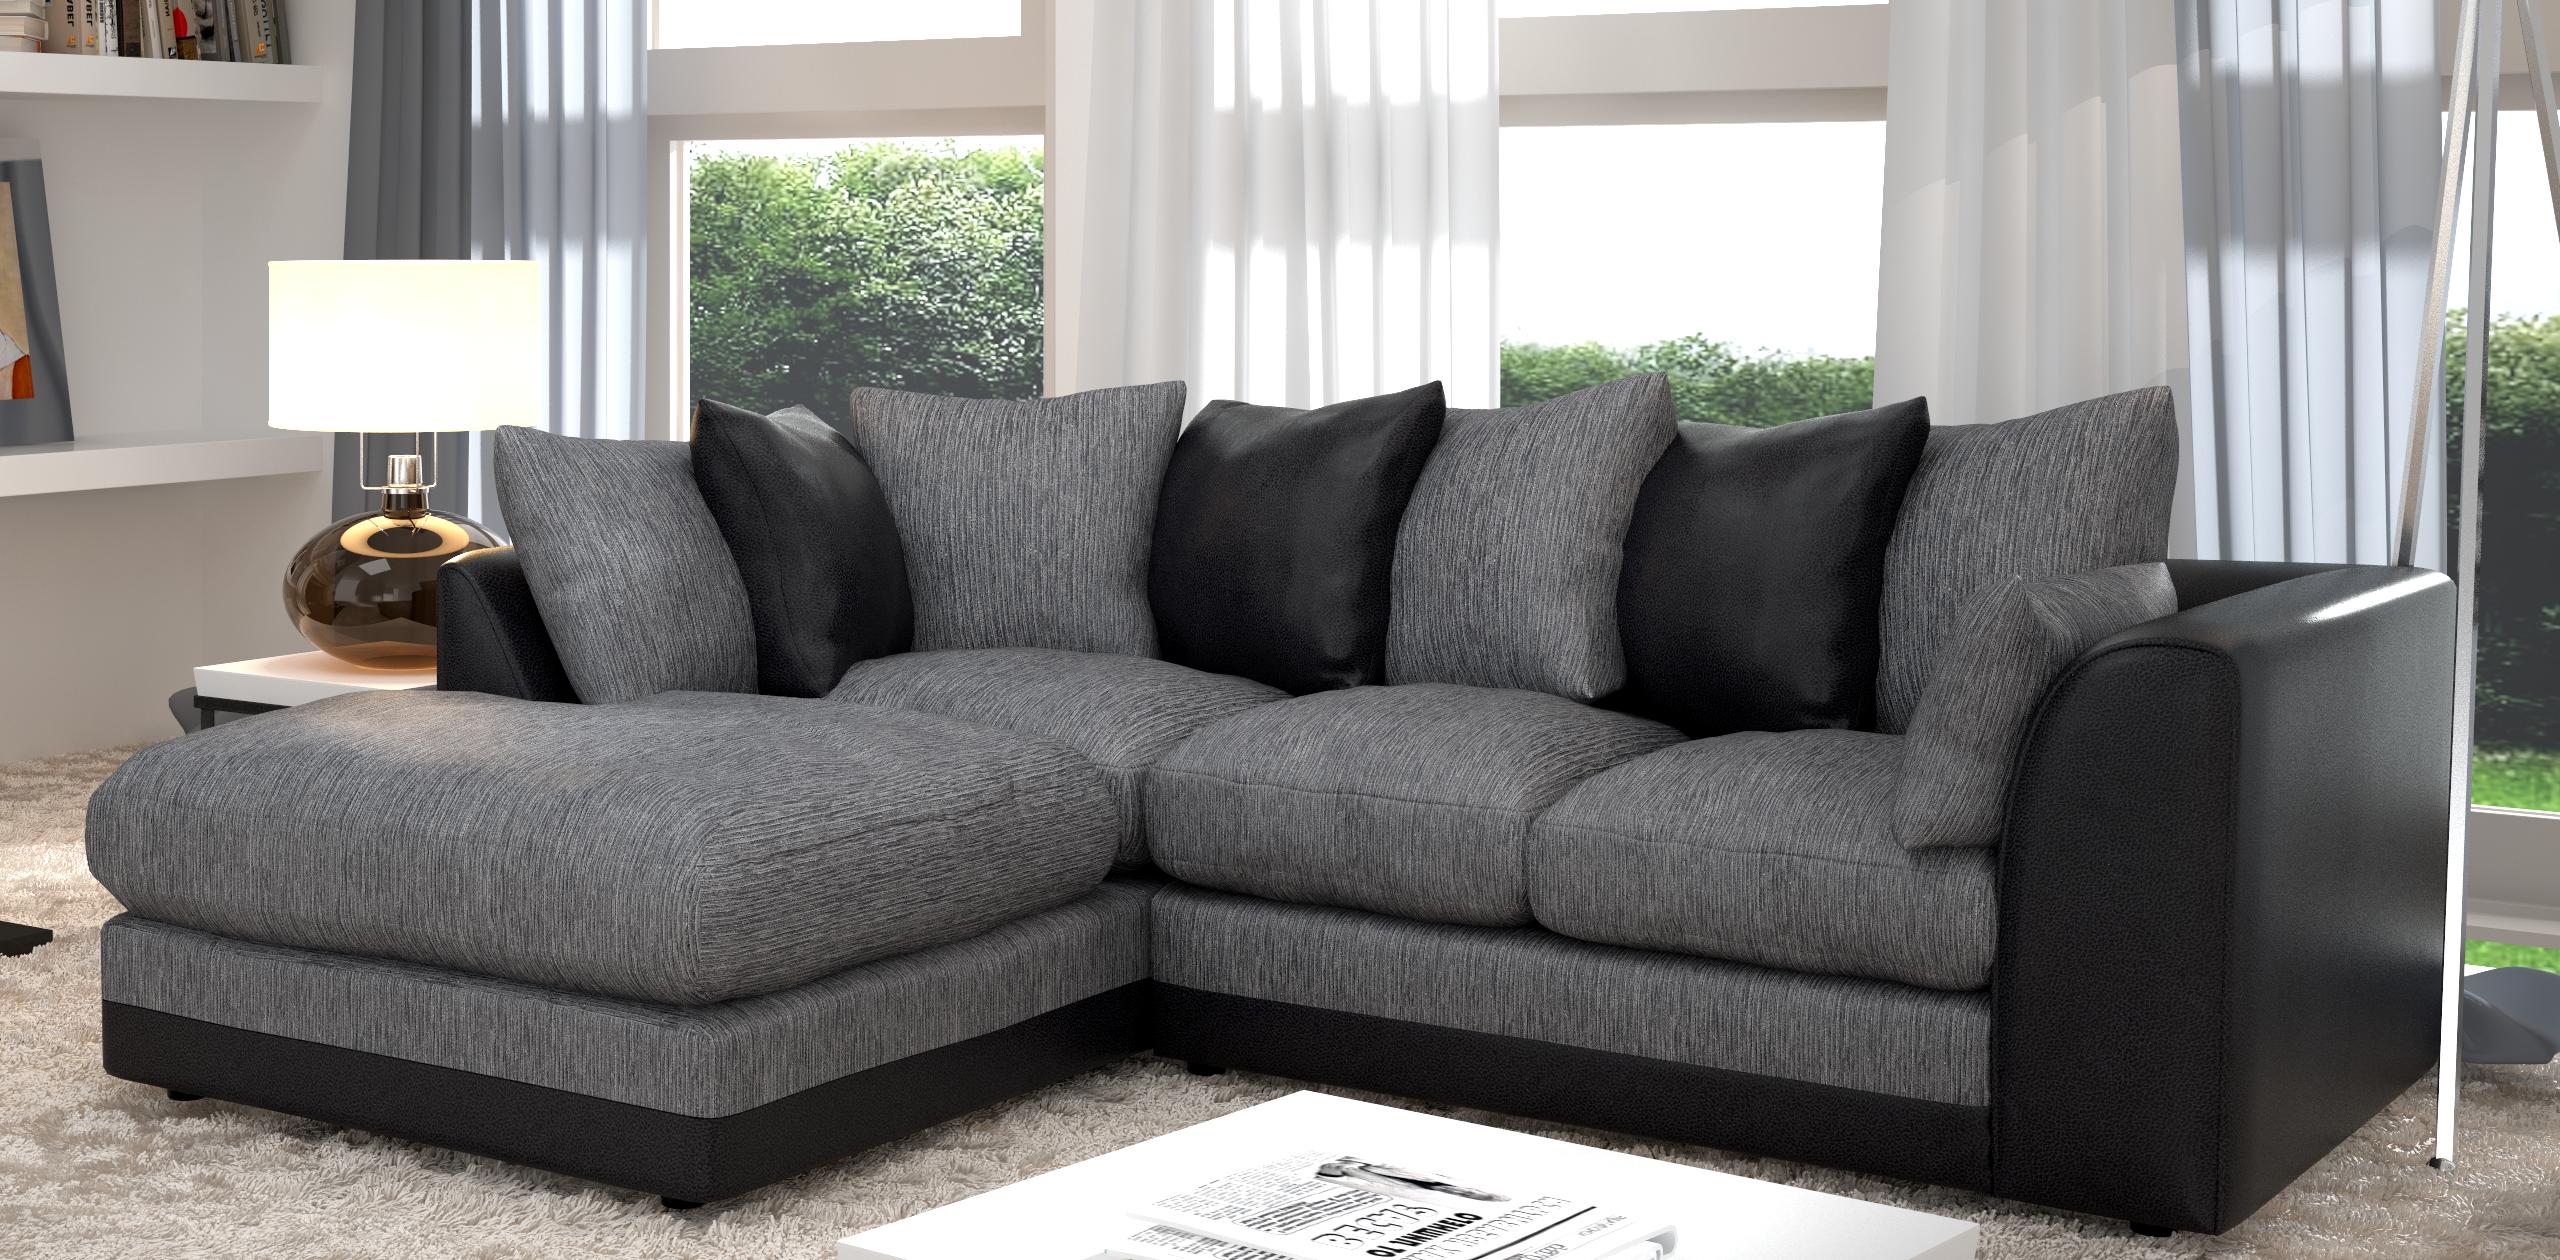 Elegant Black And Grey Sofa 74 On Fabric Sofa Ideas With Black And Grey Sofa  Luxury Black And Grey Sofa